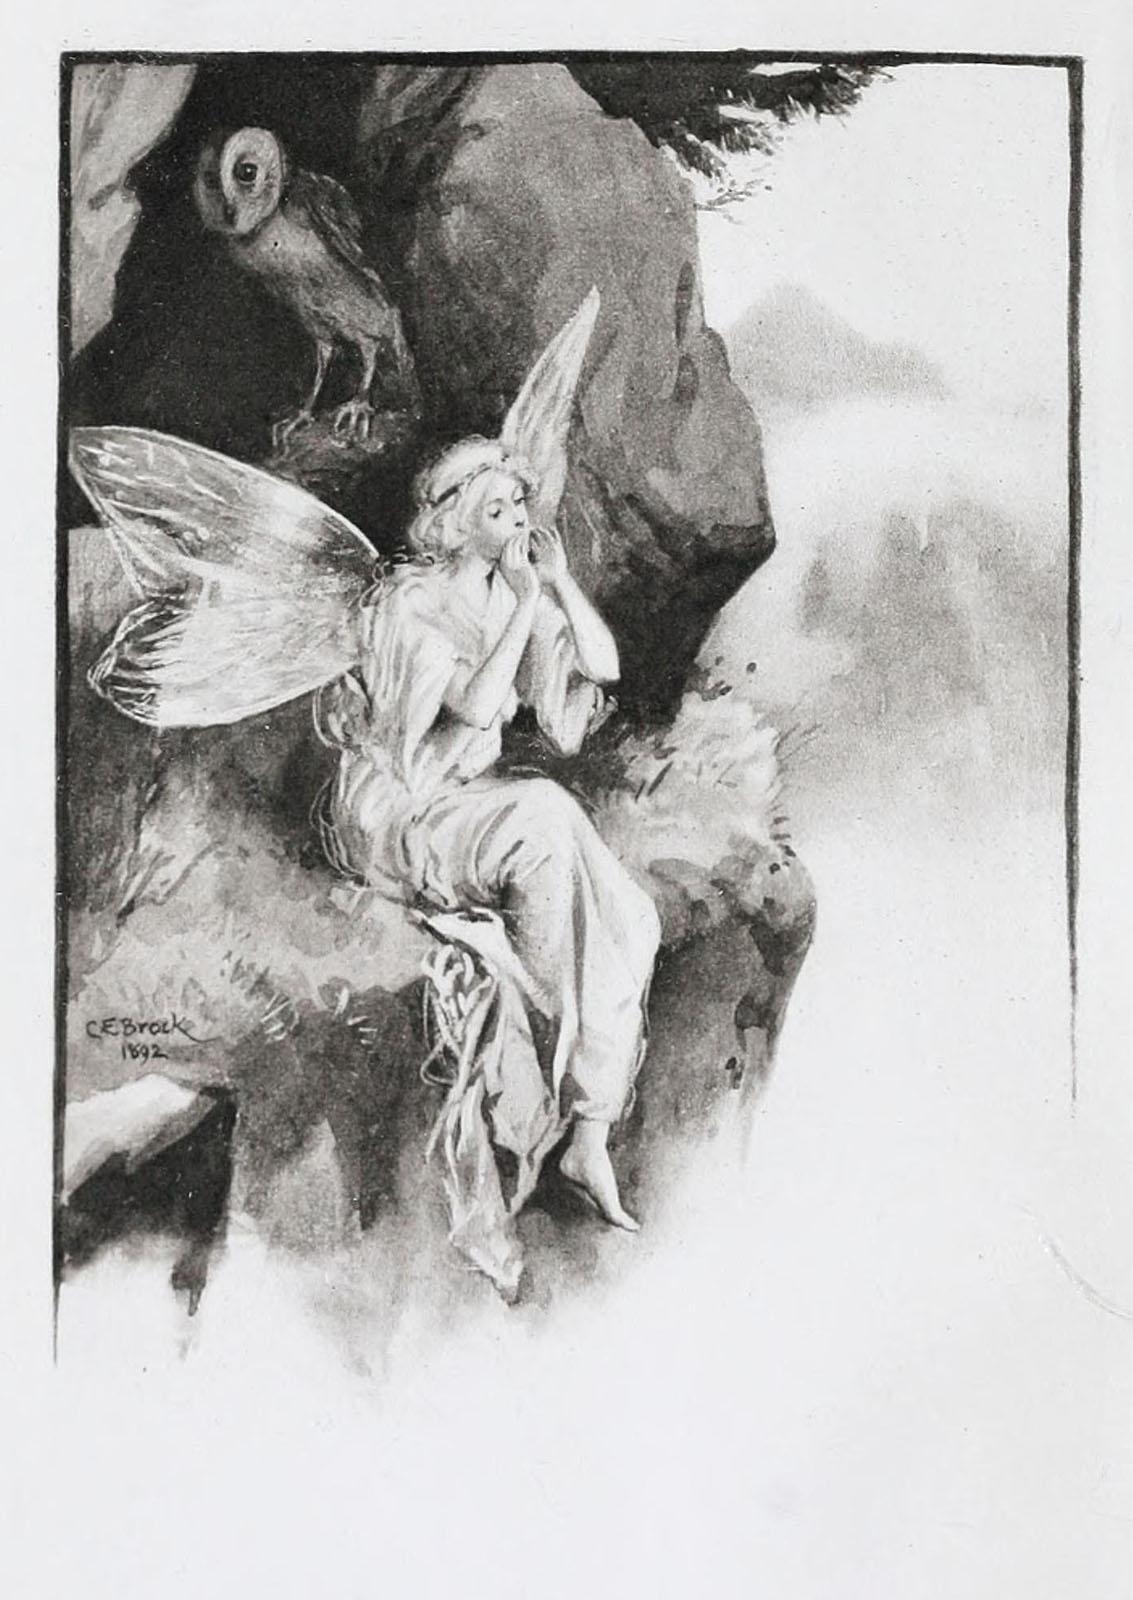 Thistledown – Midsummer Bedlam 28 — Gray Wings